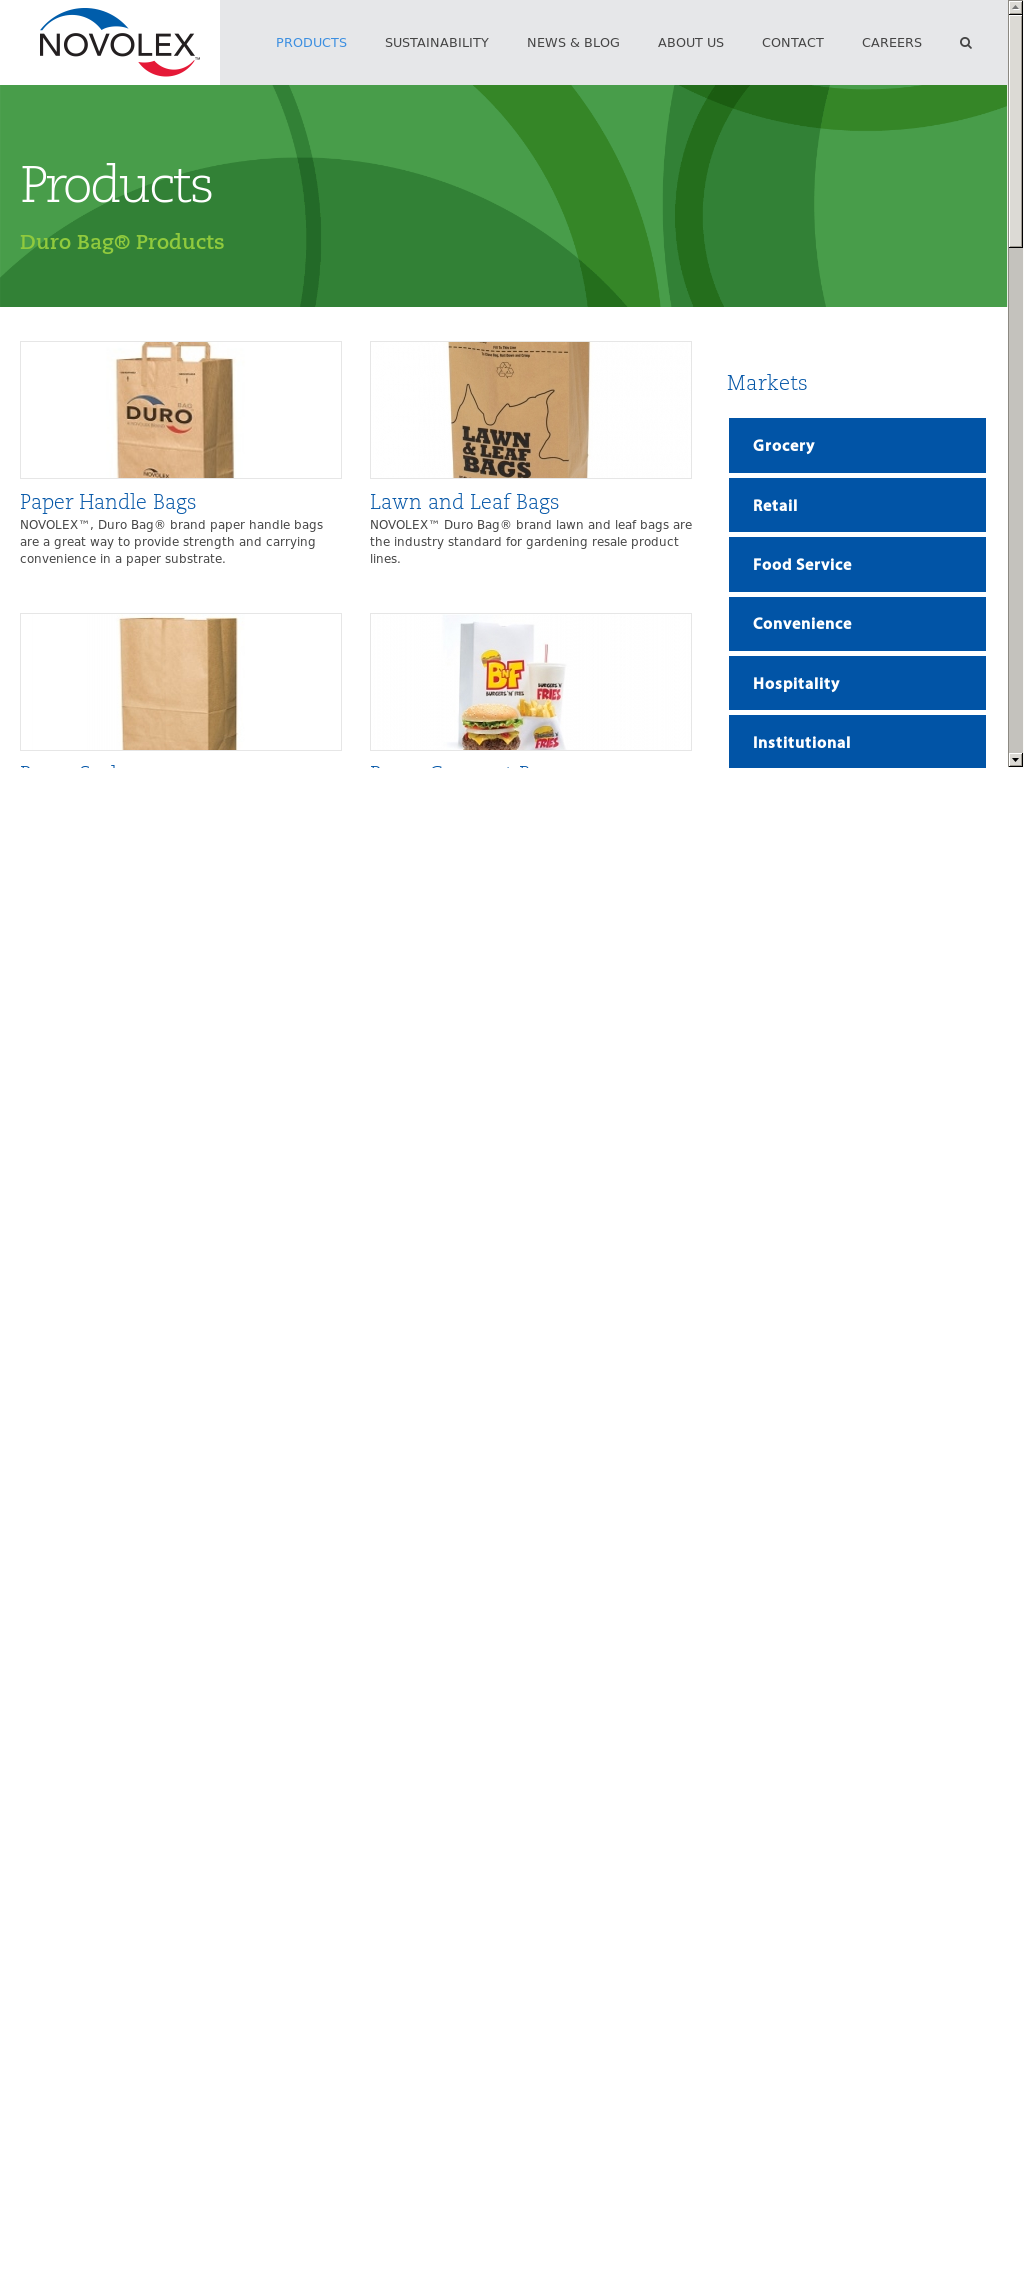 duro bag company profile owler